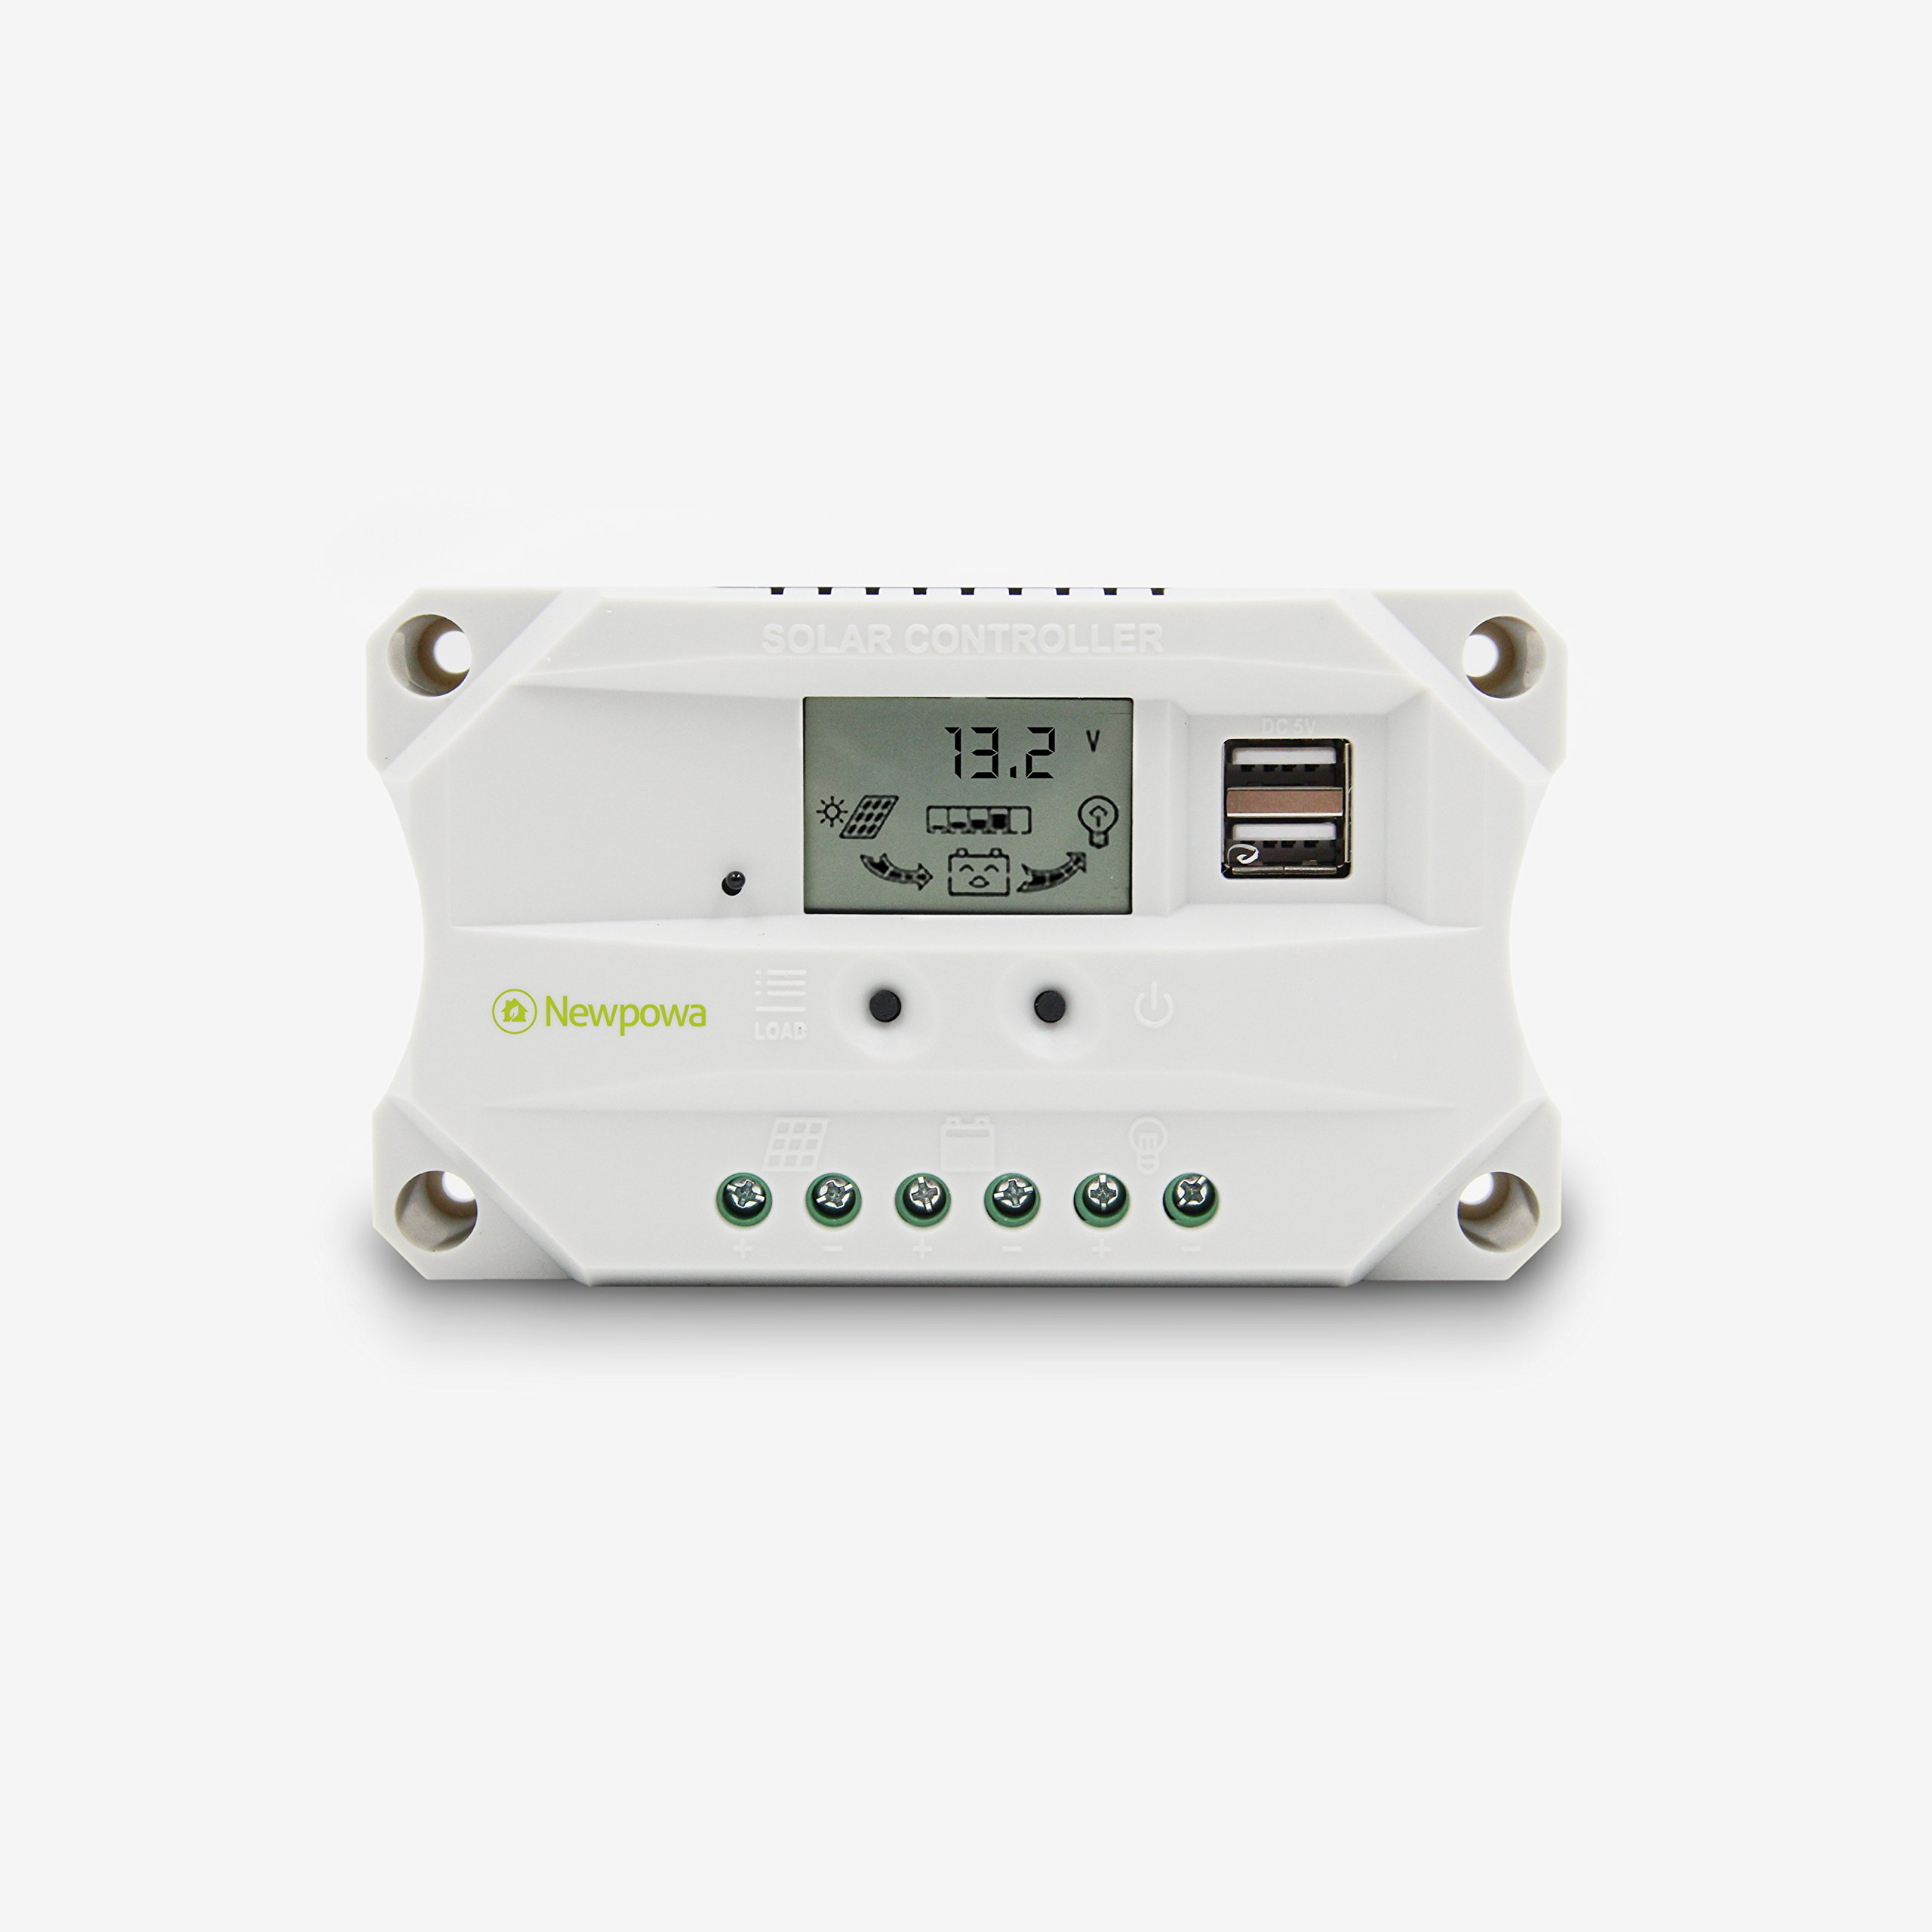 Newpowa 60w Watt 12v Solar Panel + PWM 10A 12V Charge Controller USB Regulator by Newpowa